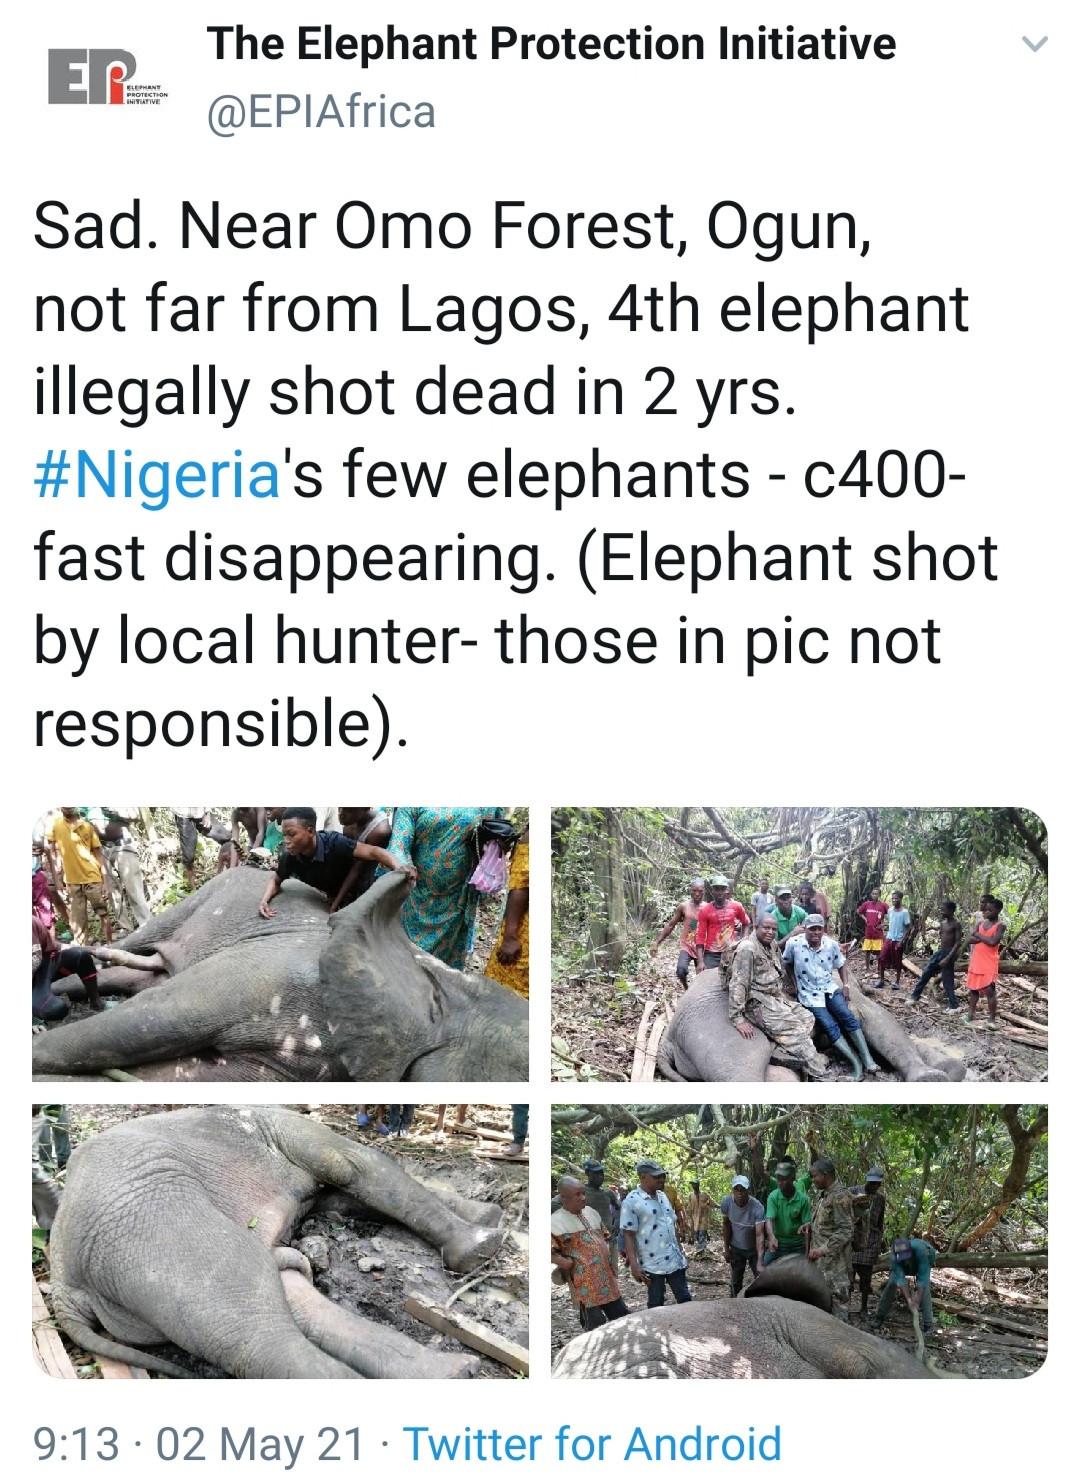 Local hunters kill 4th elephant in 2 years in Ogun state